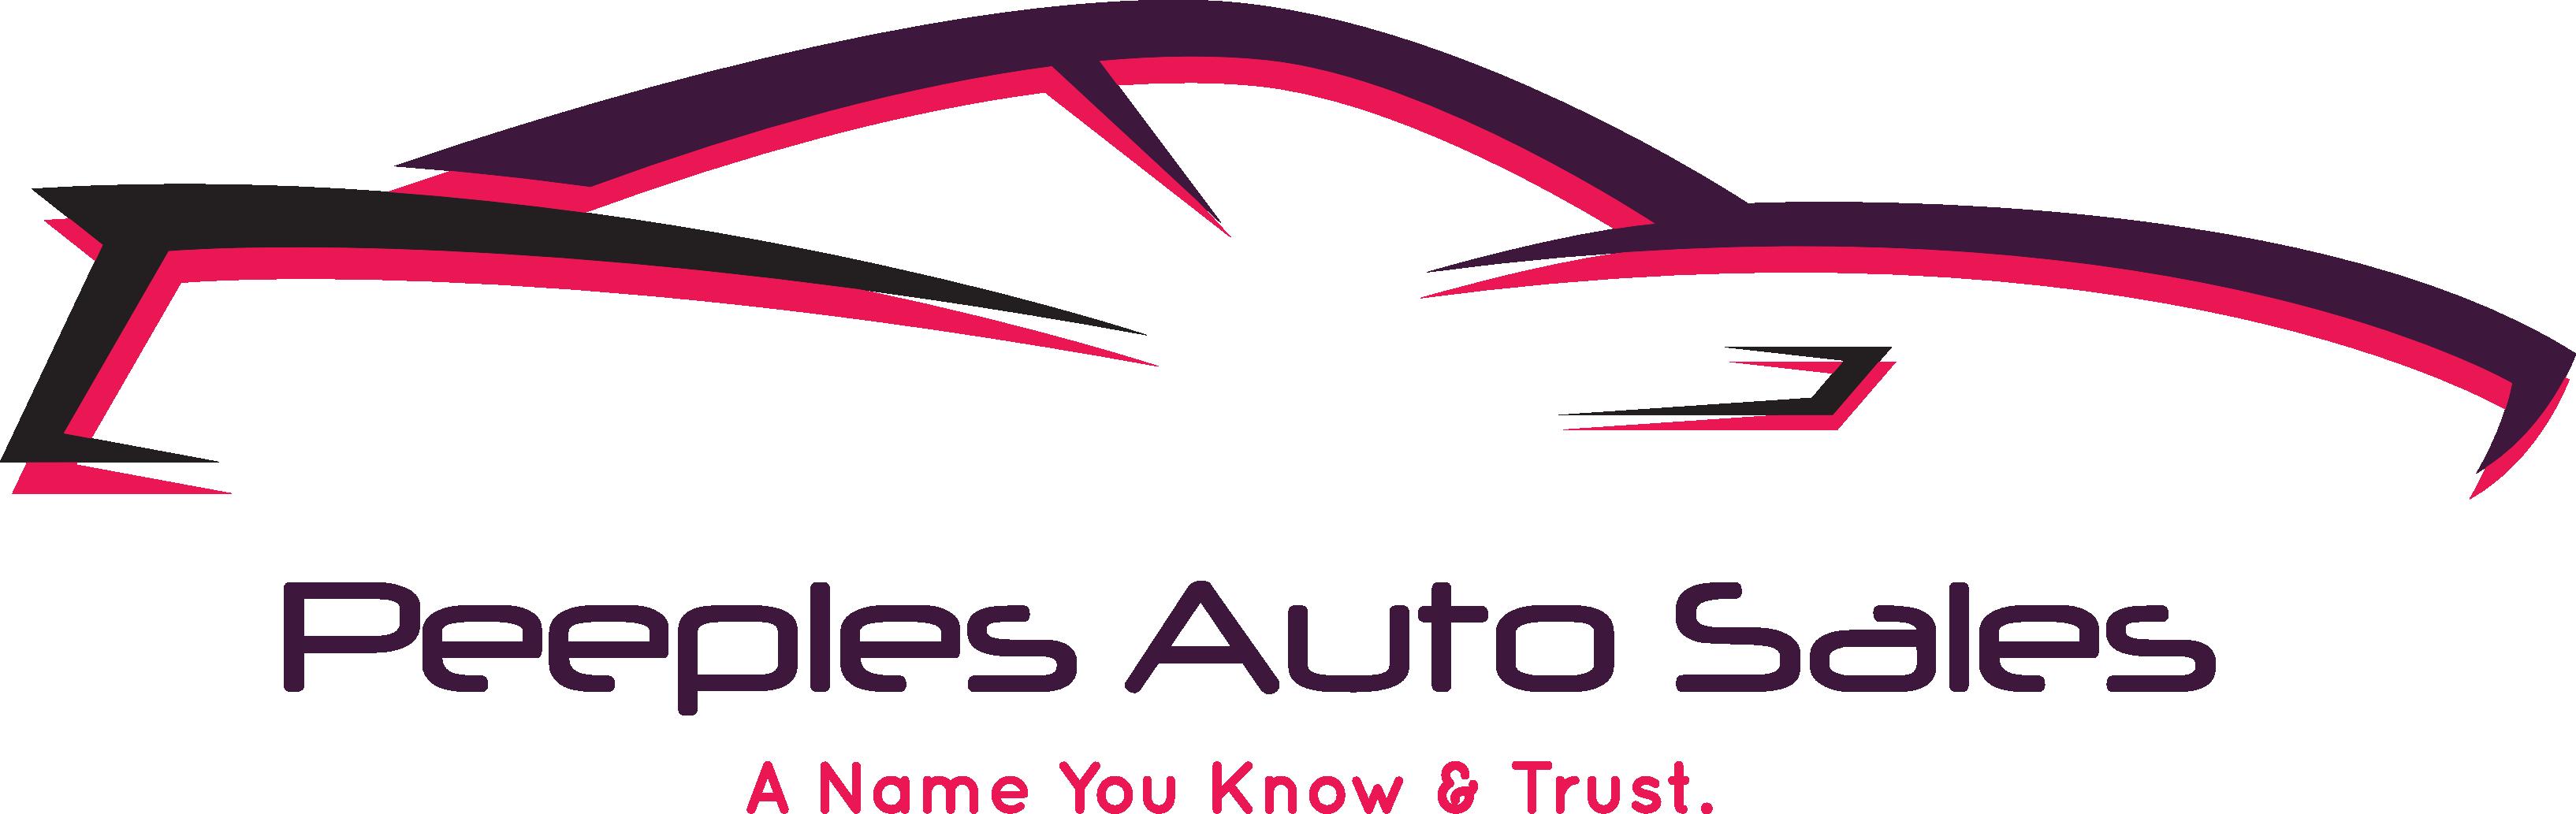 Peeples Auto Sales